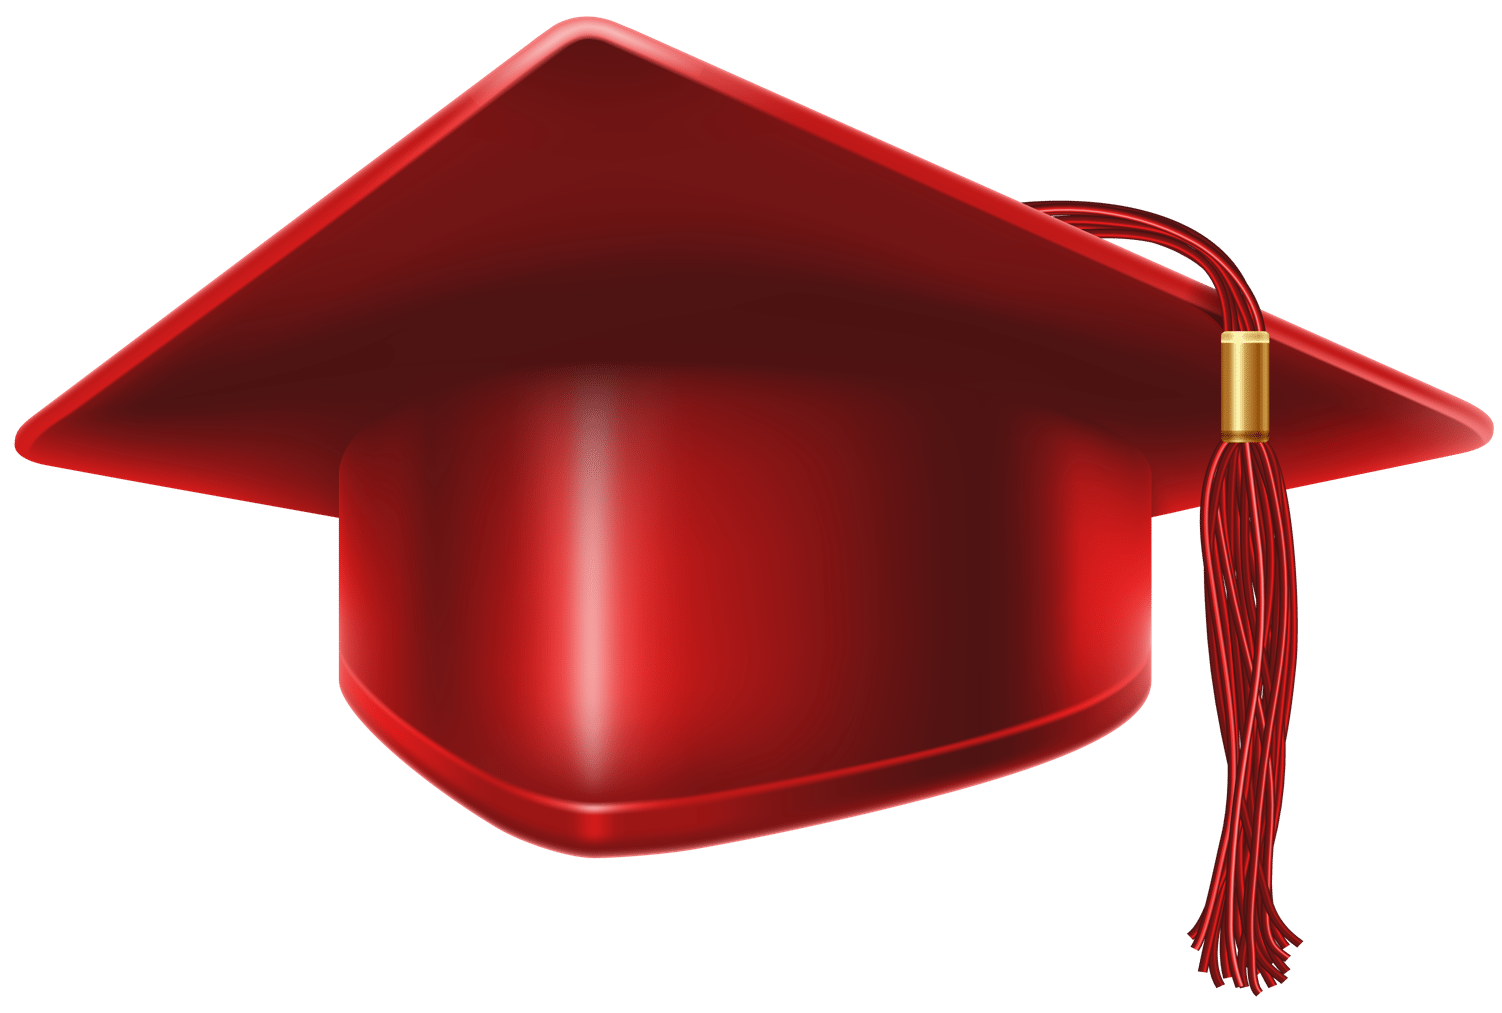 masters degree clip